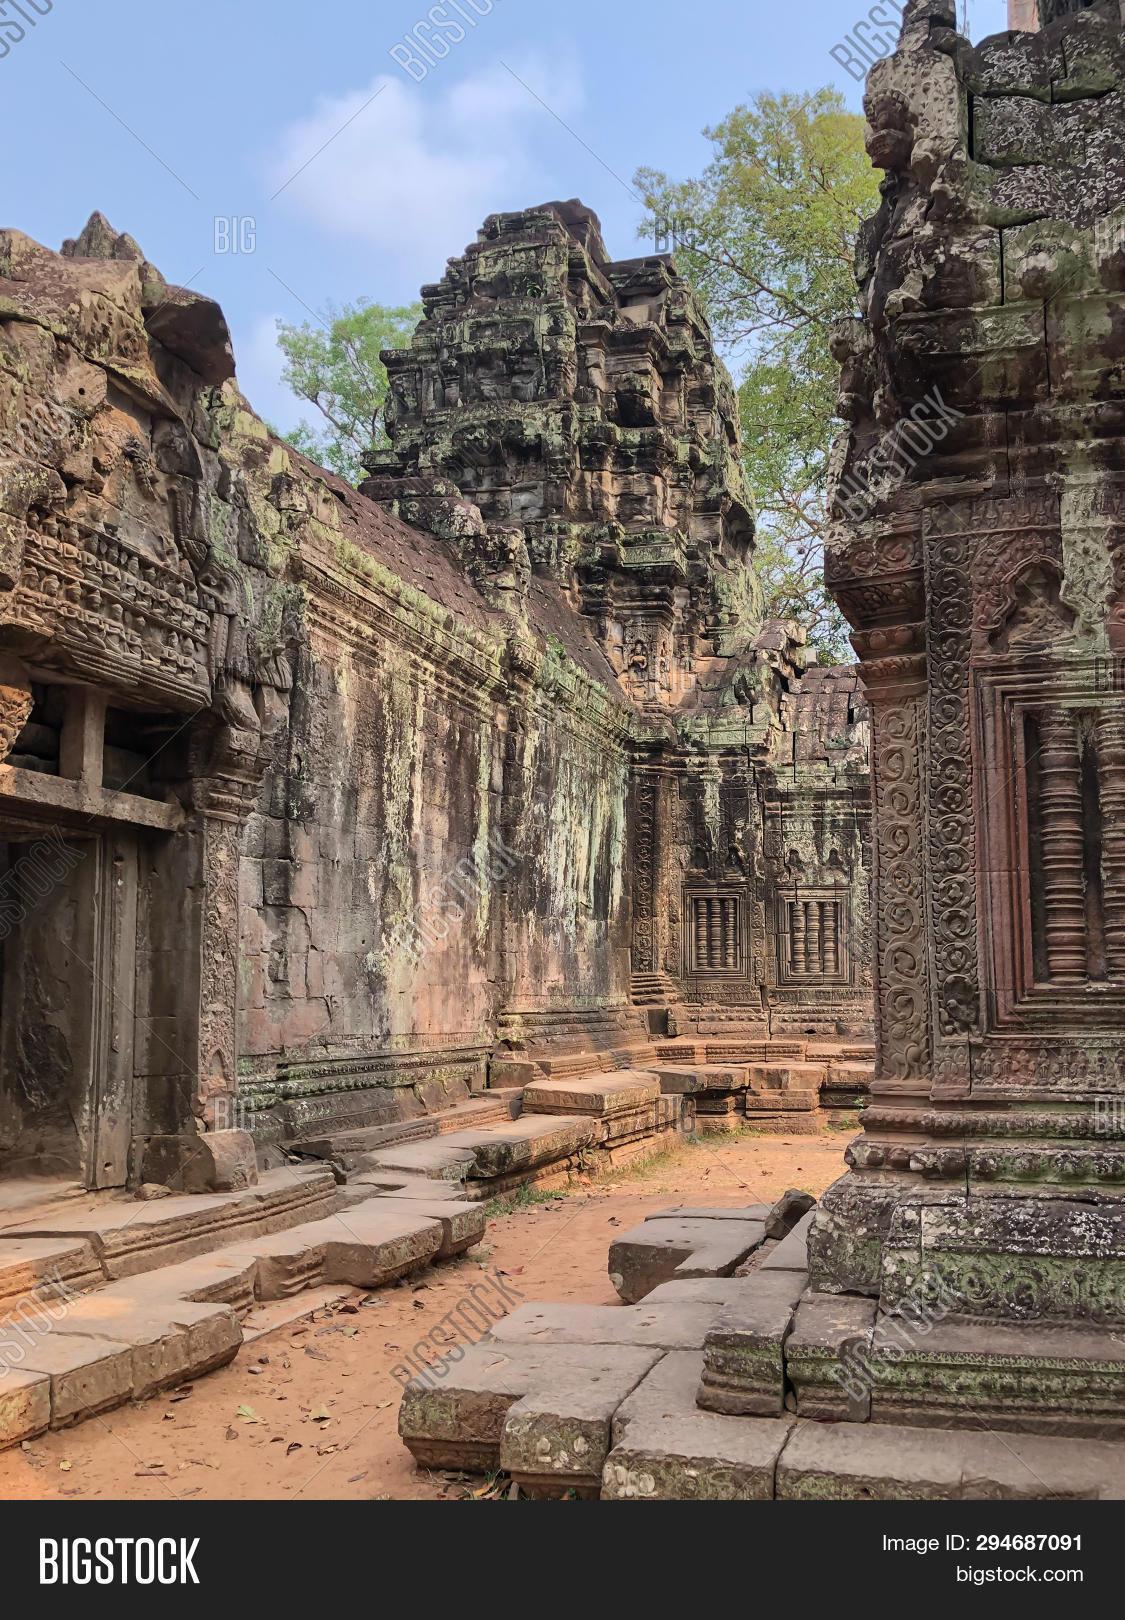 Angkor Cambodia Image & Photo (Free Trial)   Bigstock